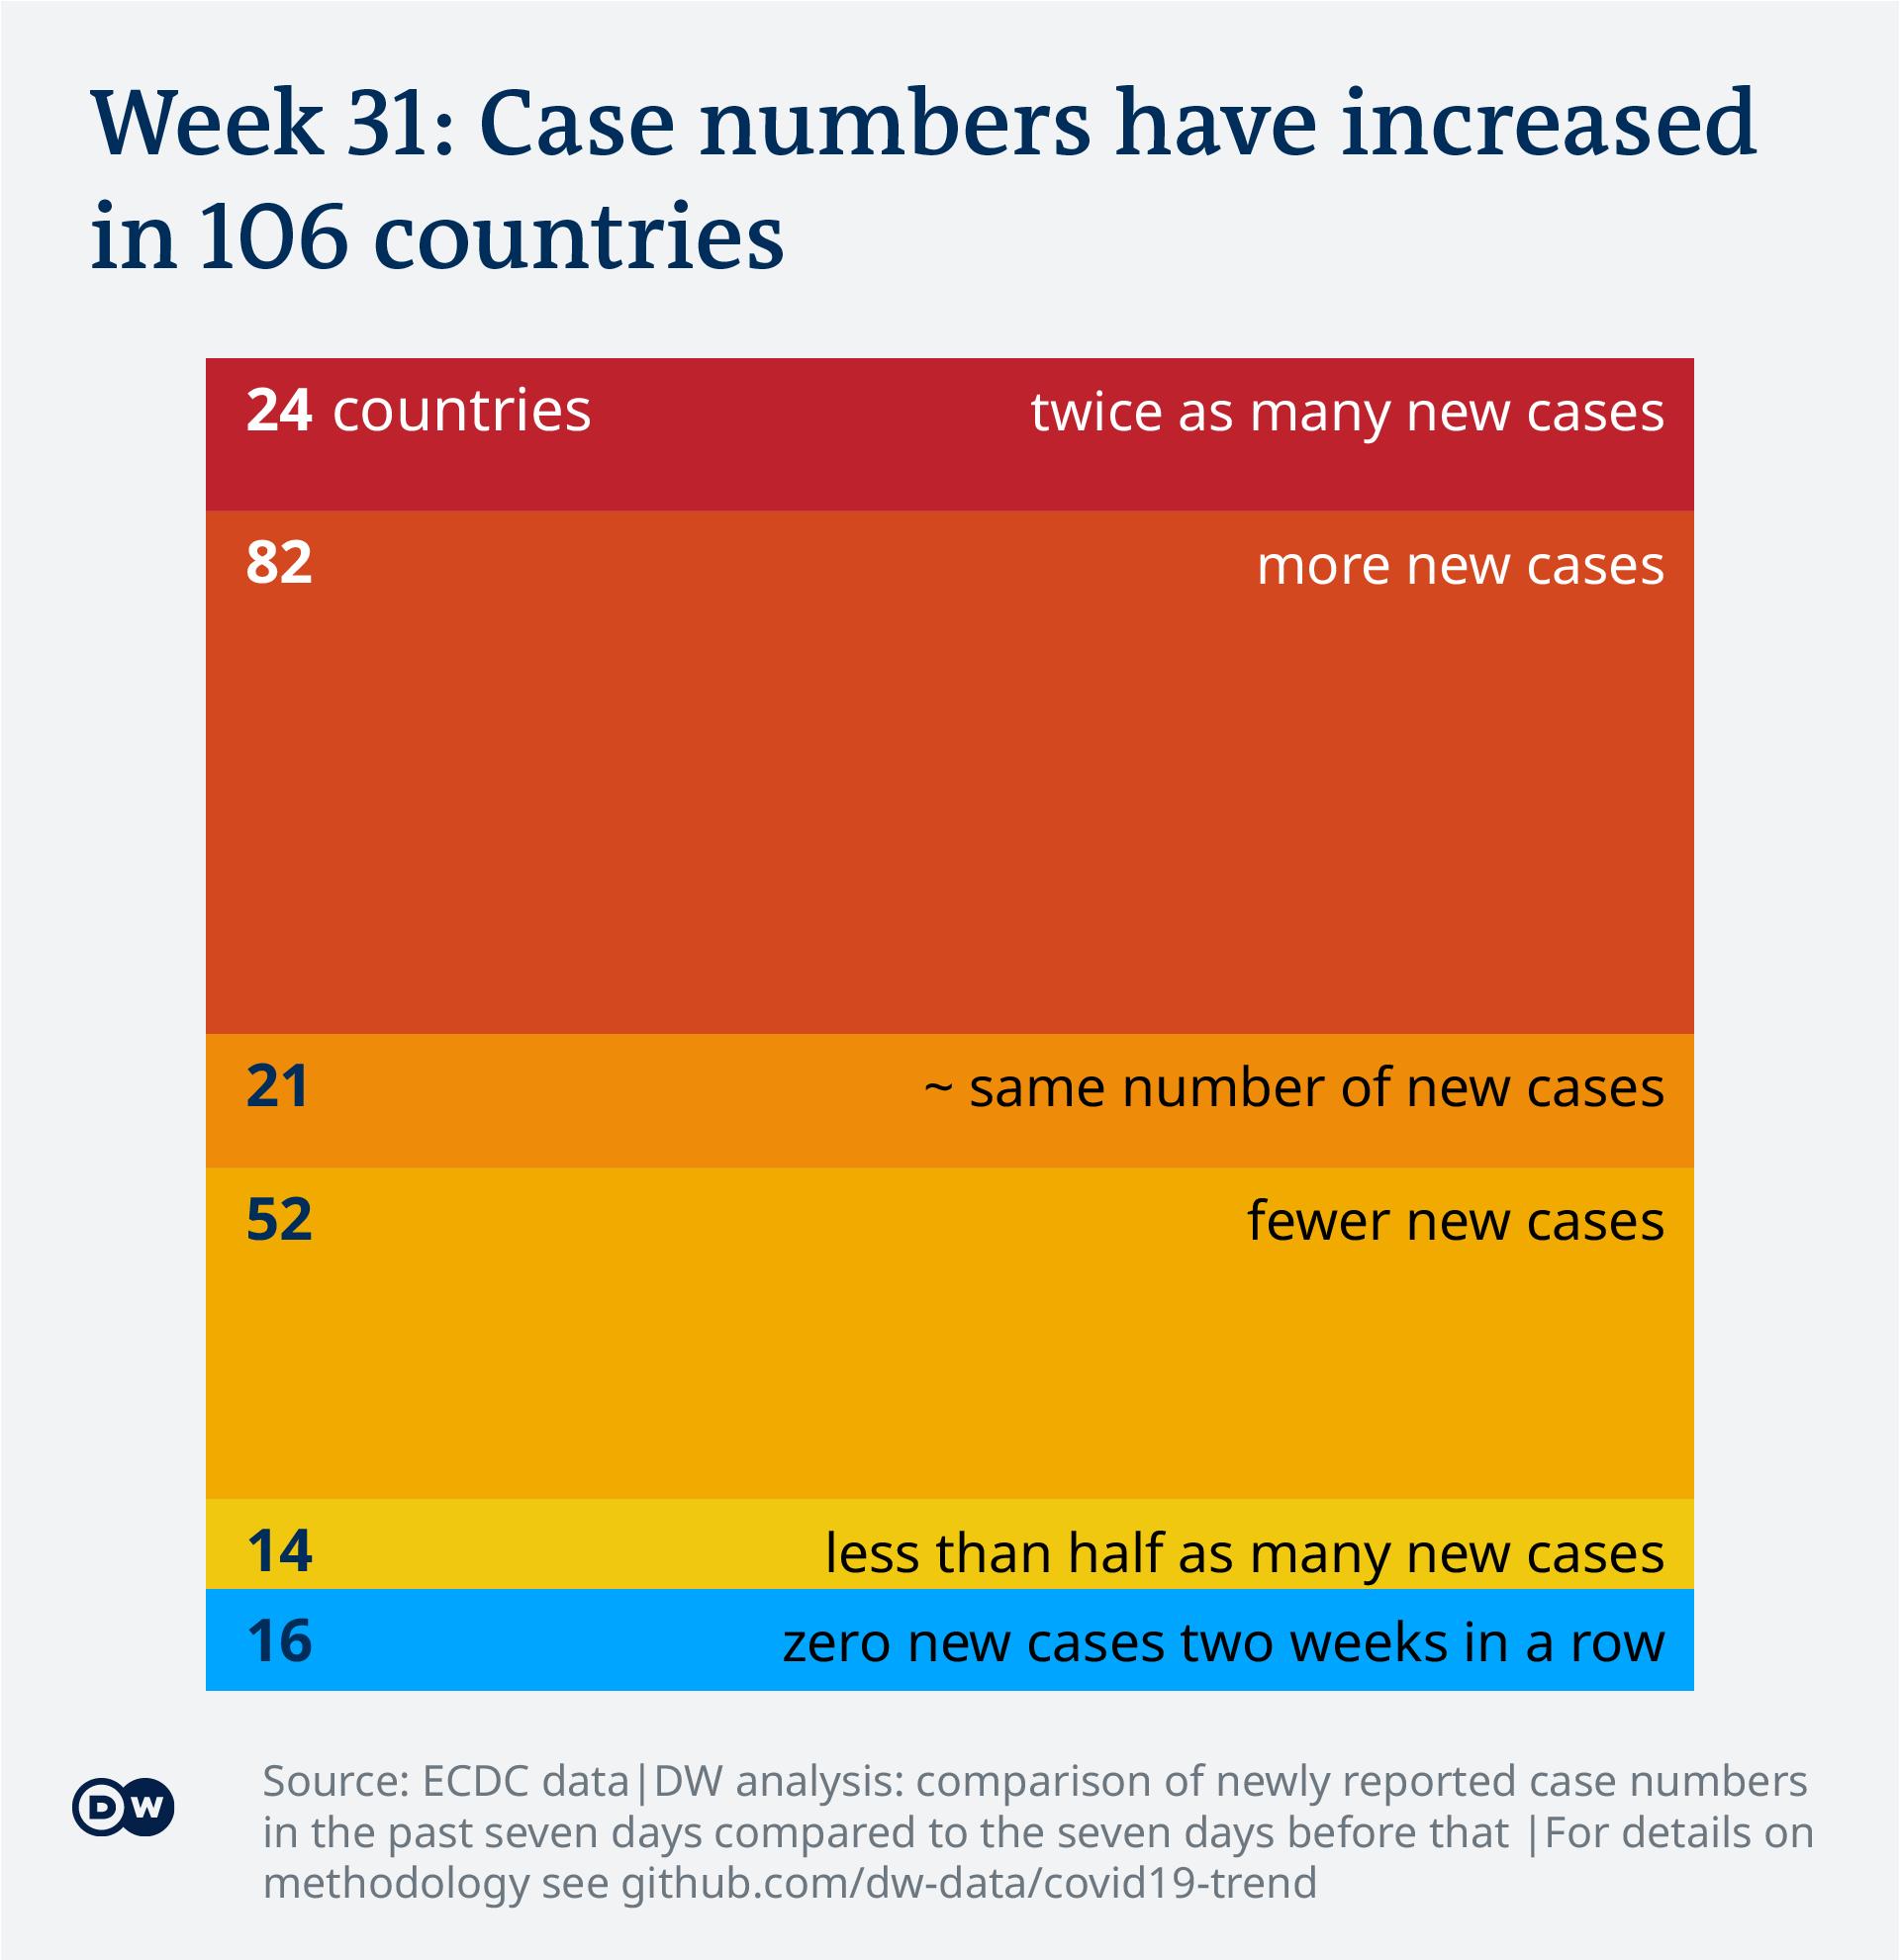 Data visualization: Covid-19 global new case numbers trend - calendar week 31